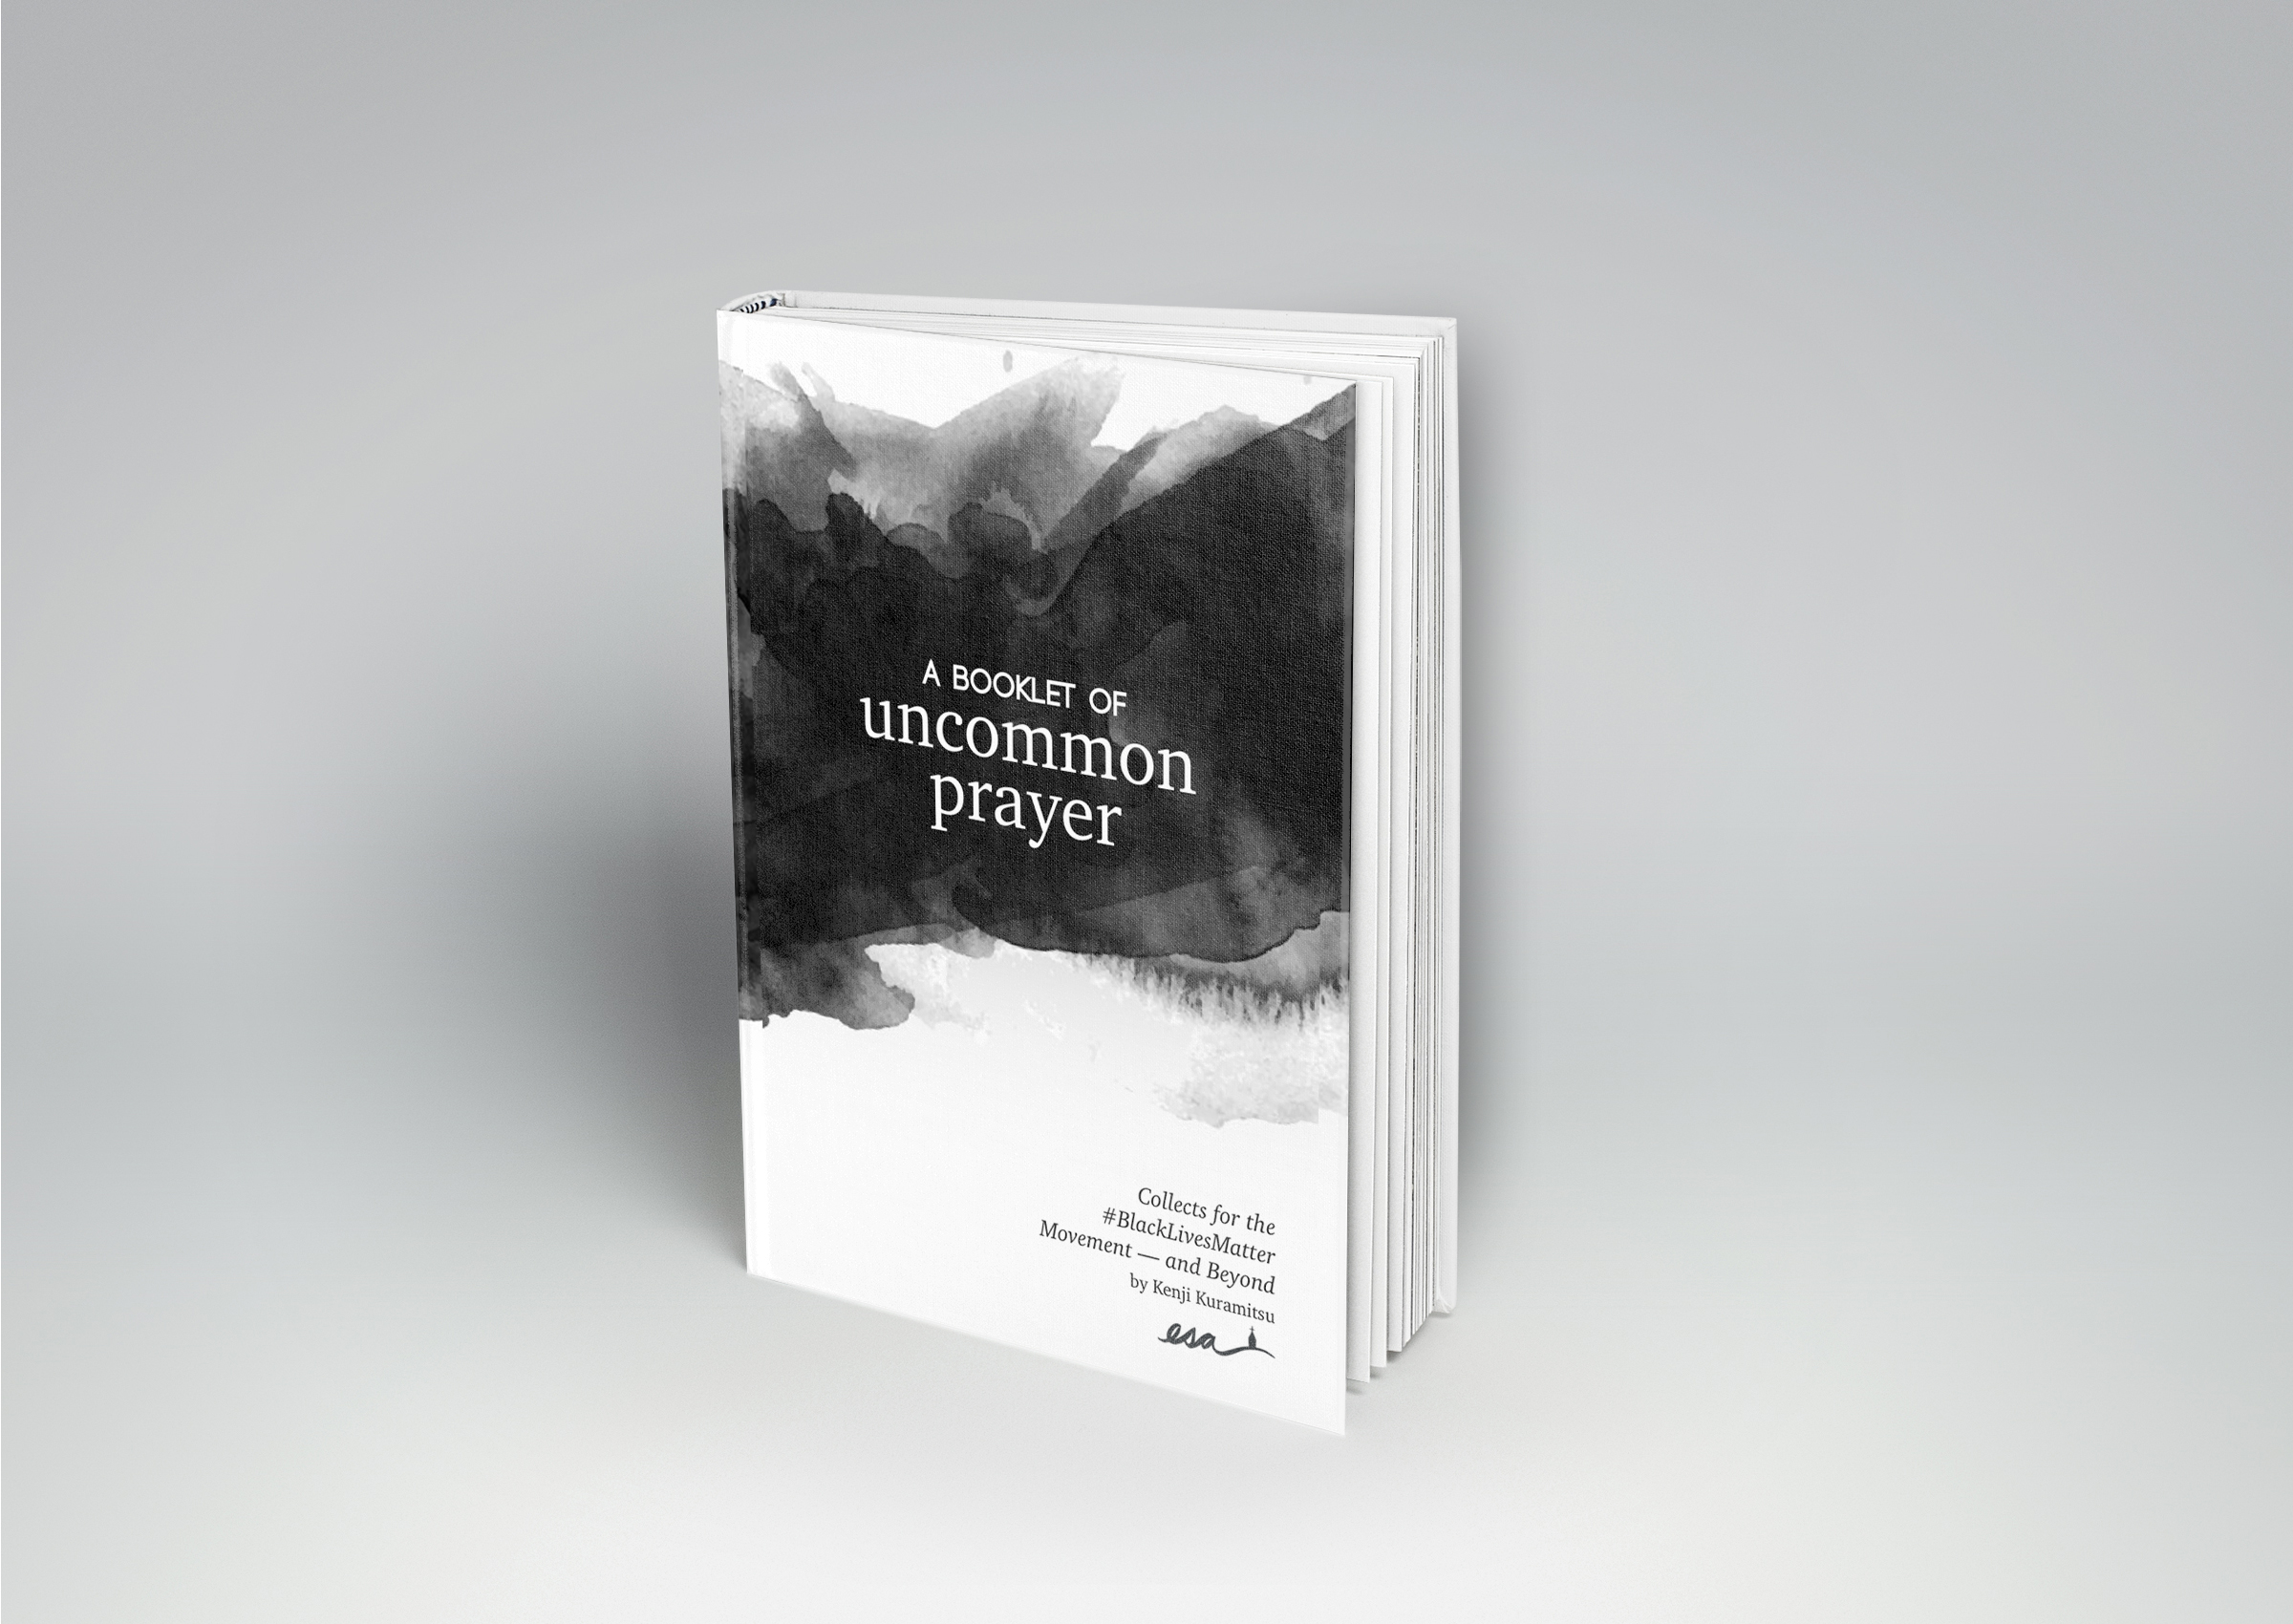 UncommonPrayer_Book_MockUp.jpg